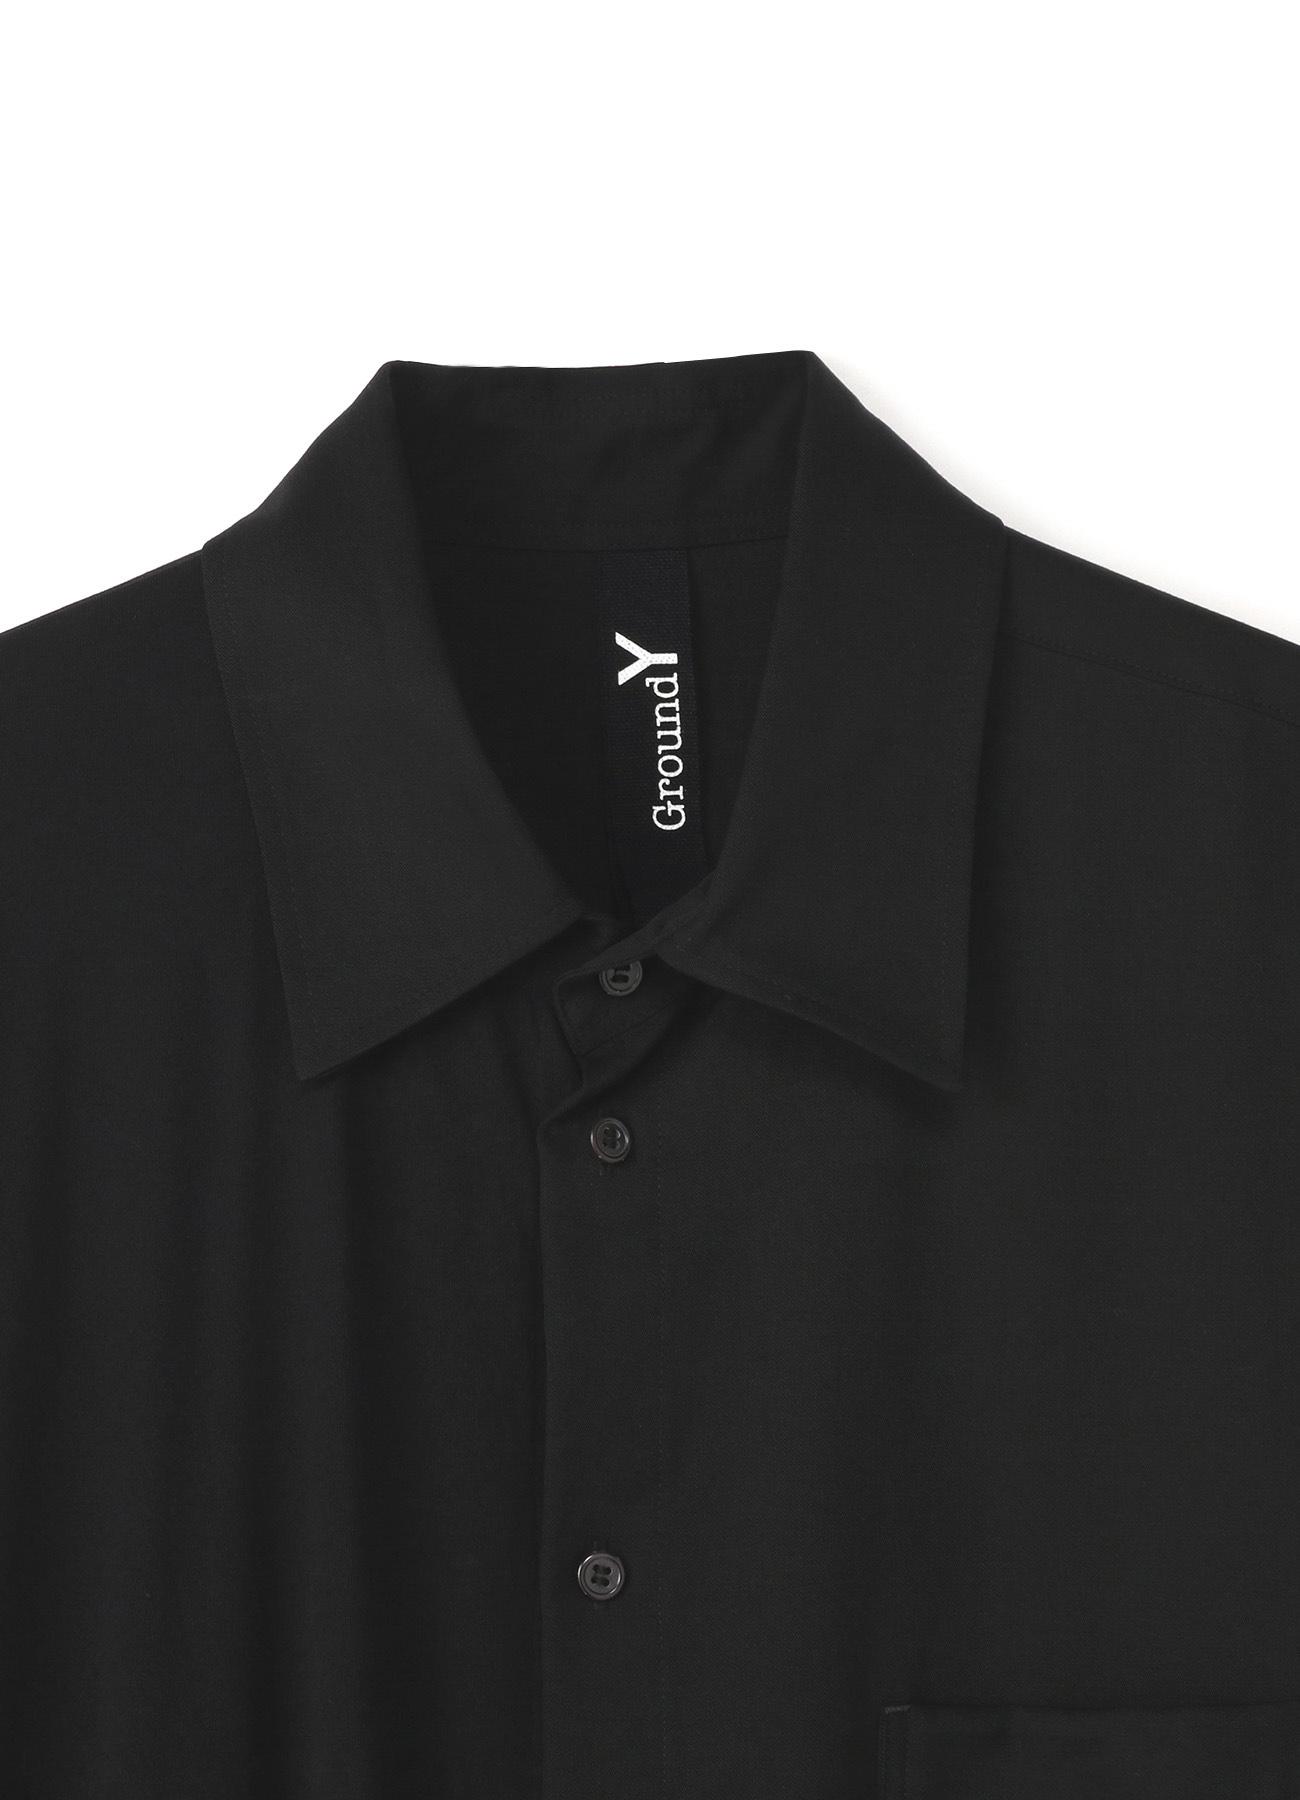 TE/Burberry/Jersey Cape Docking Shirt